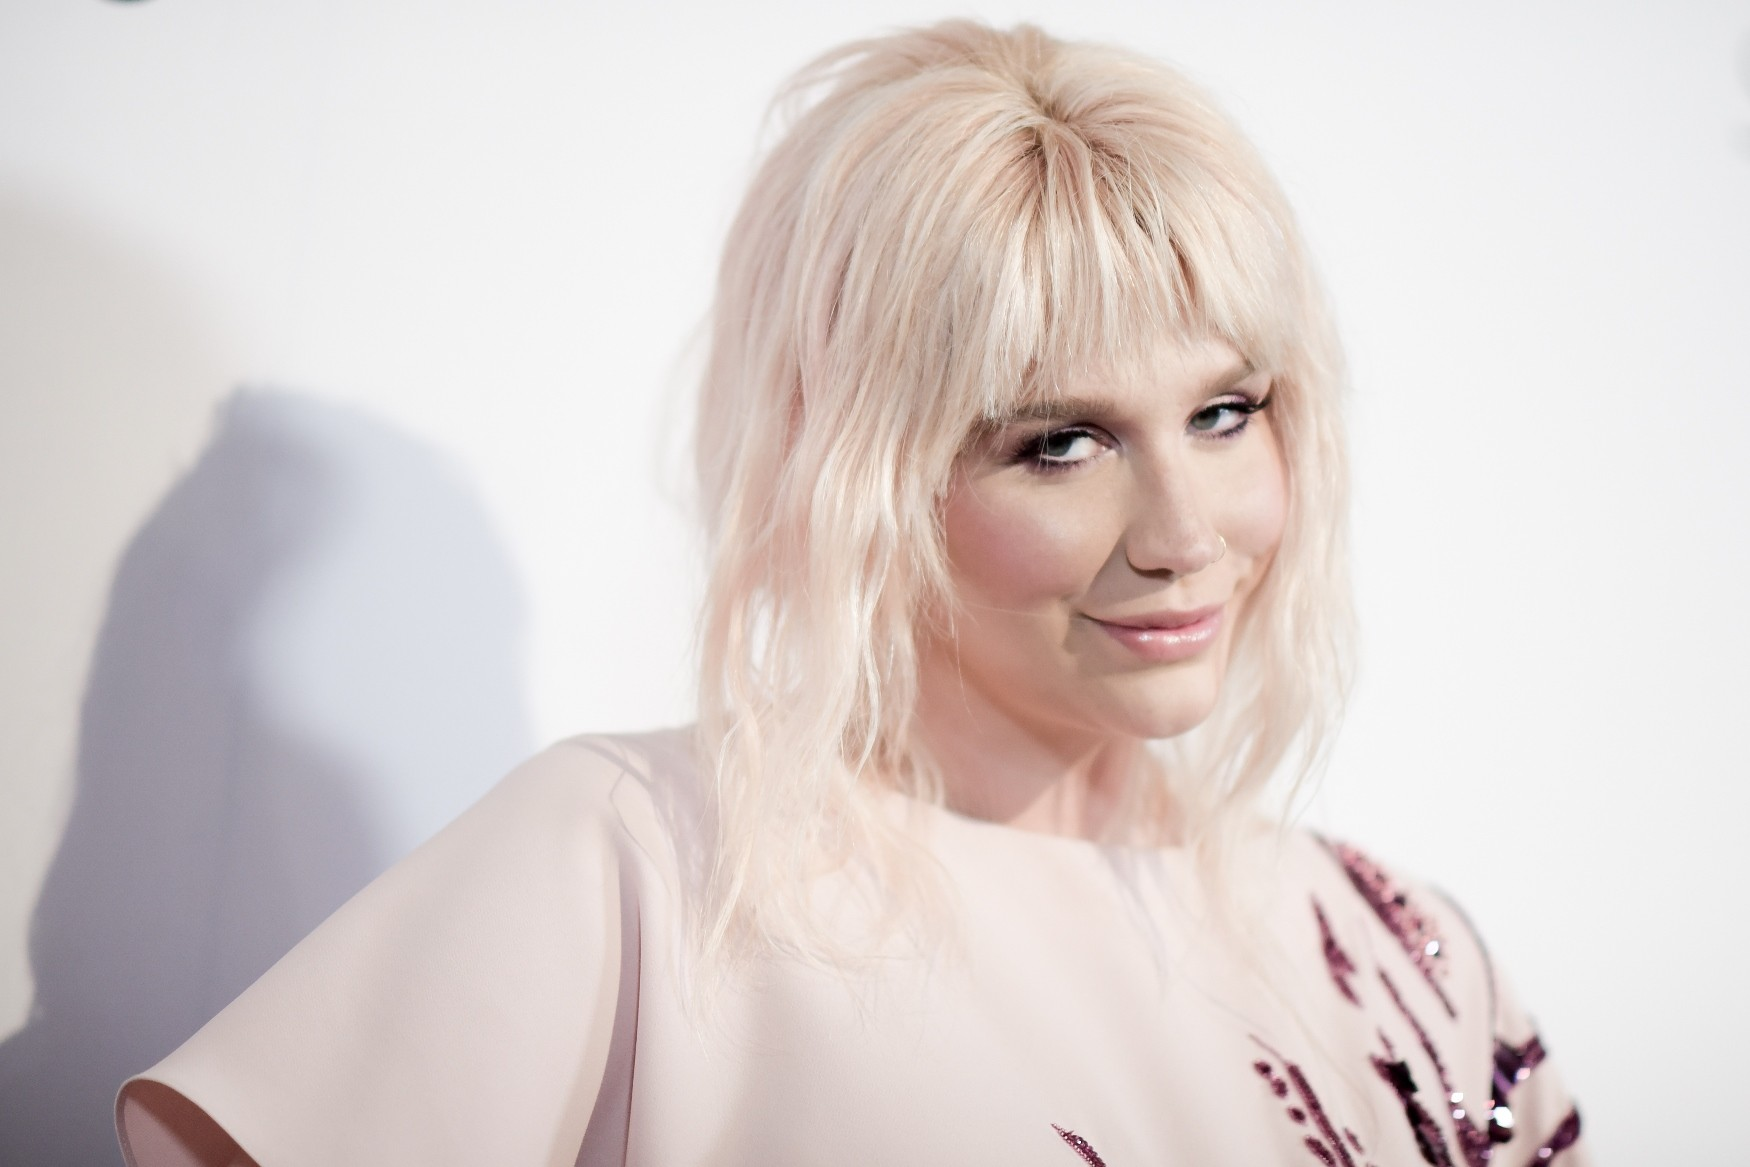 Kesha  proibida por gravadora de Dr. Luke a se apresentar em premiao (Foto: Richard Shotwell/Invision/AP)